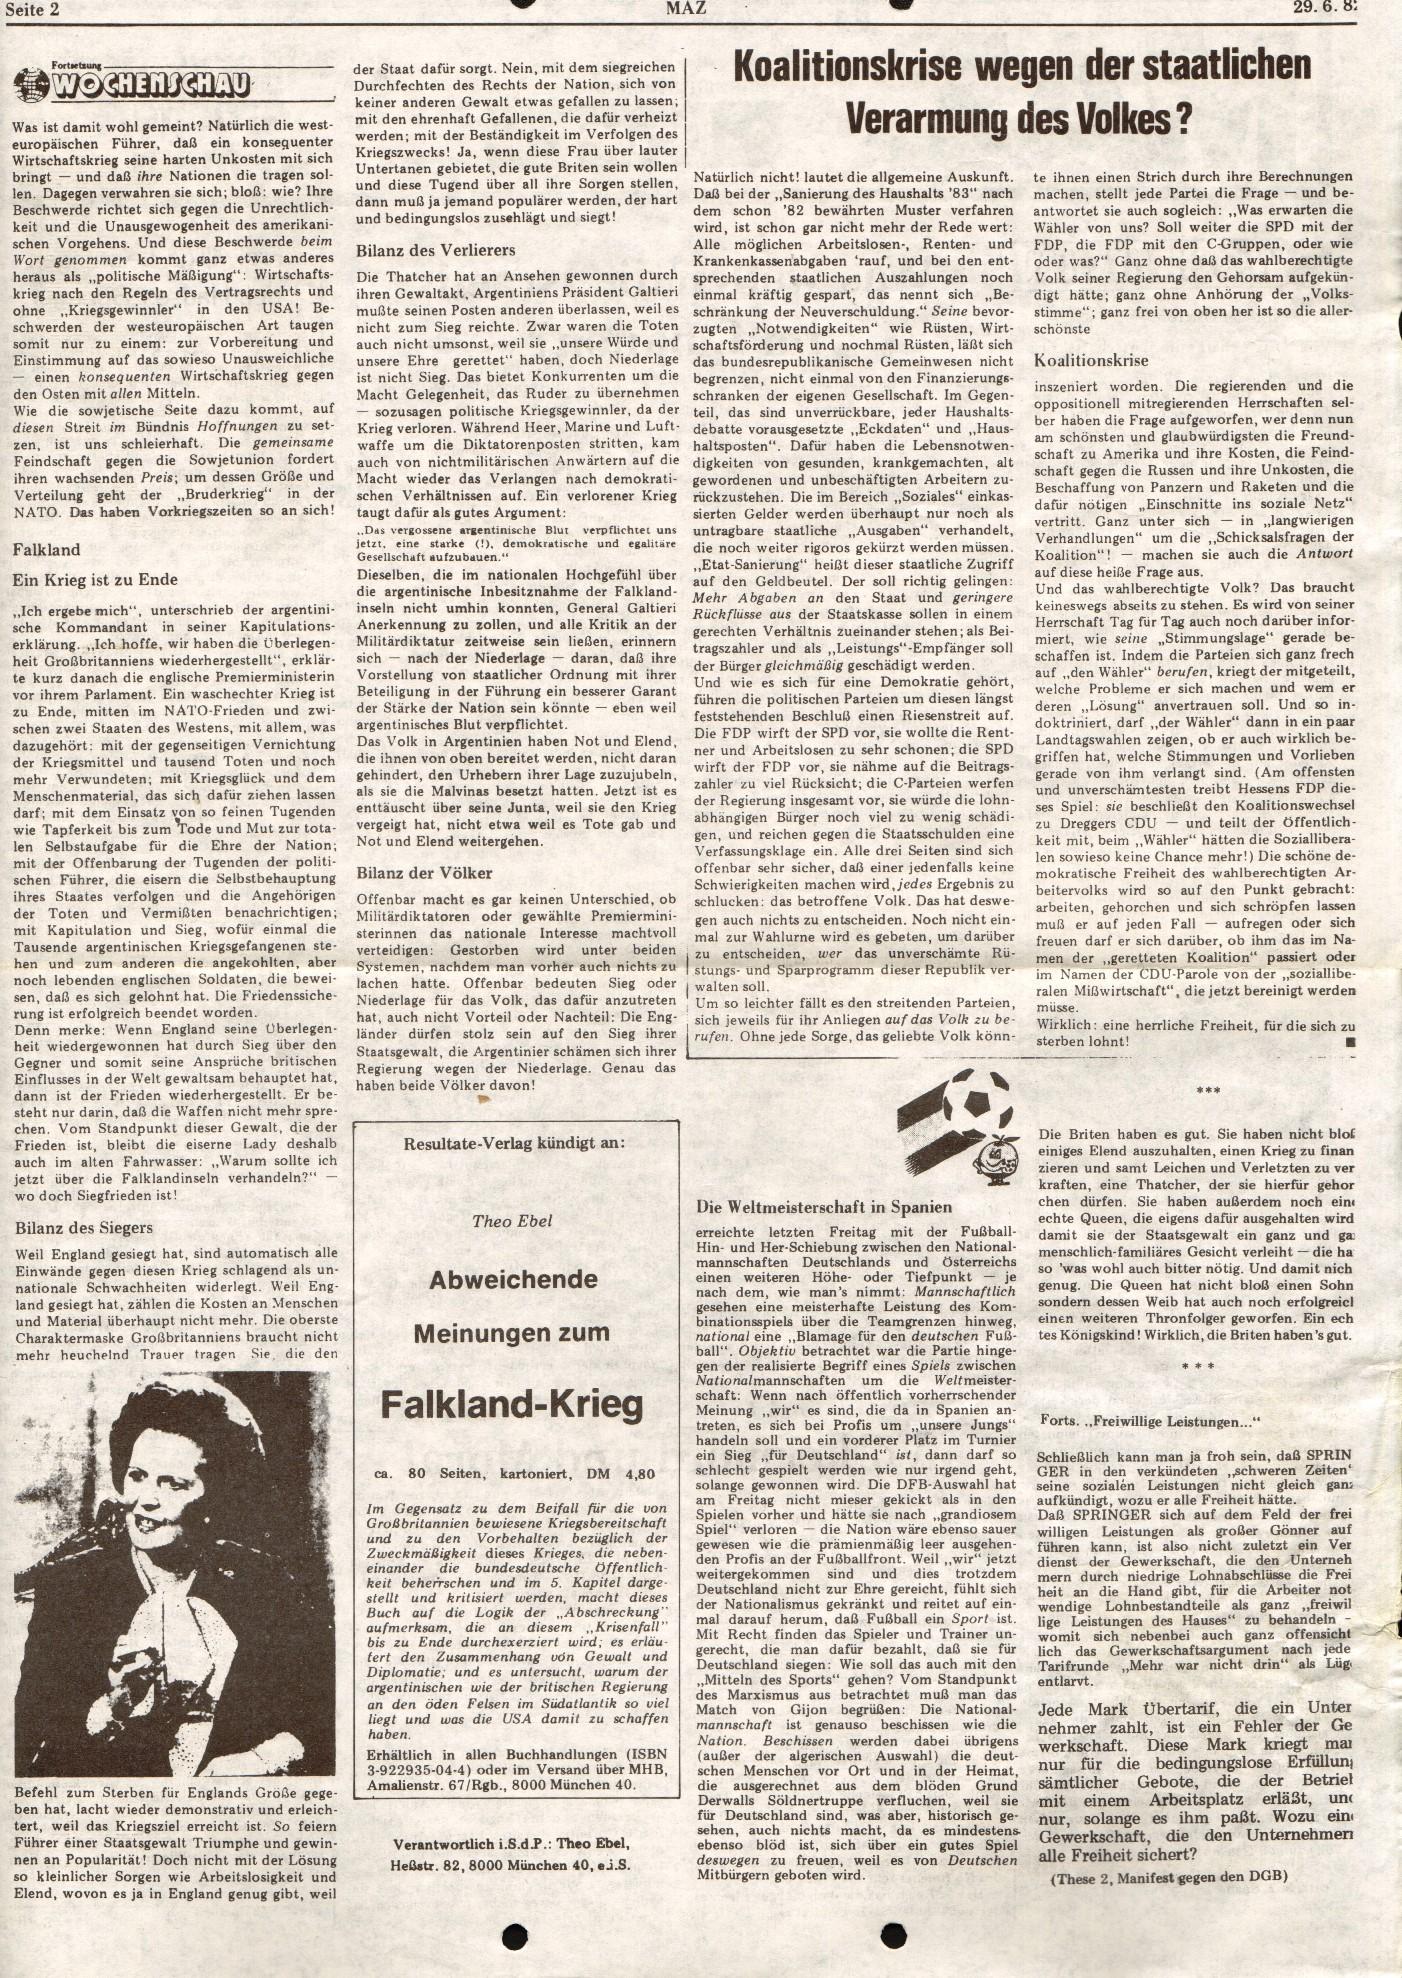 Hamburg_MG_MAZ_Druck_19820629_02